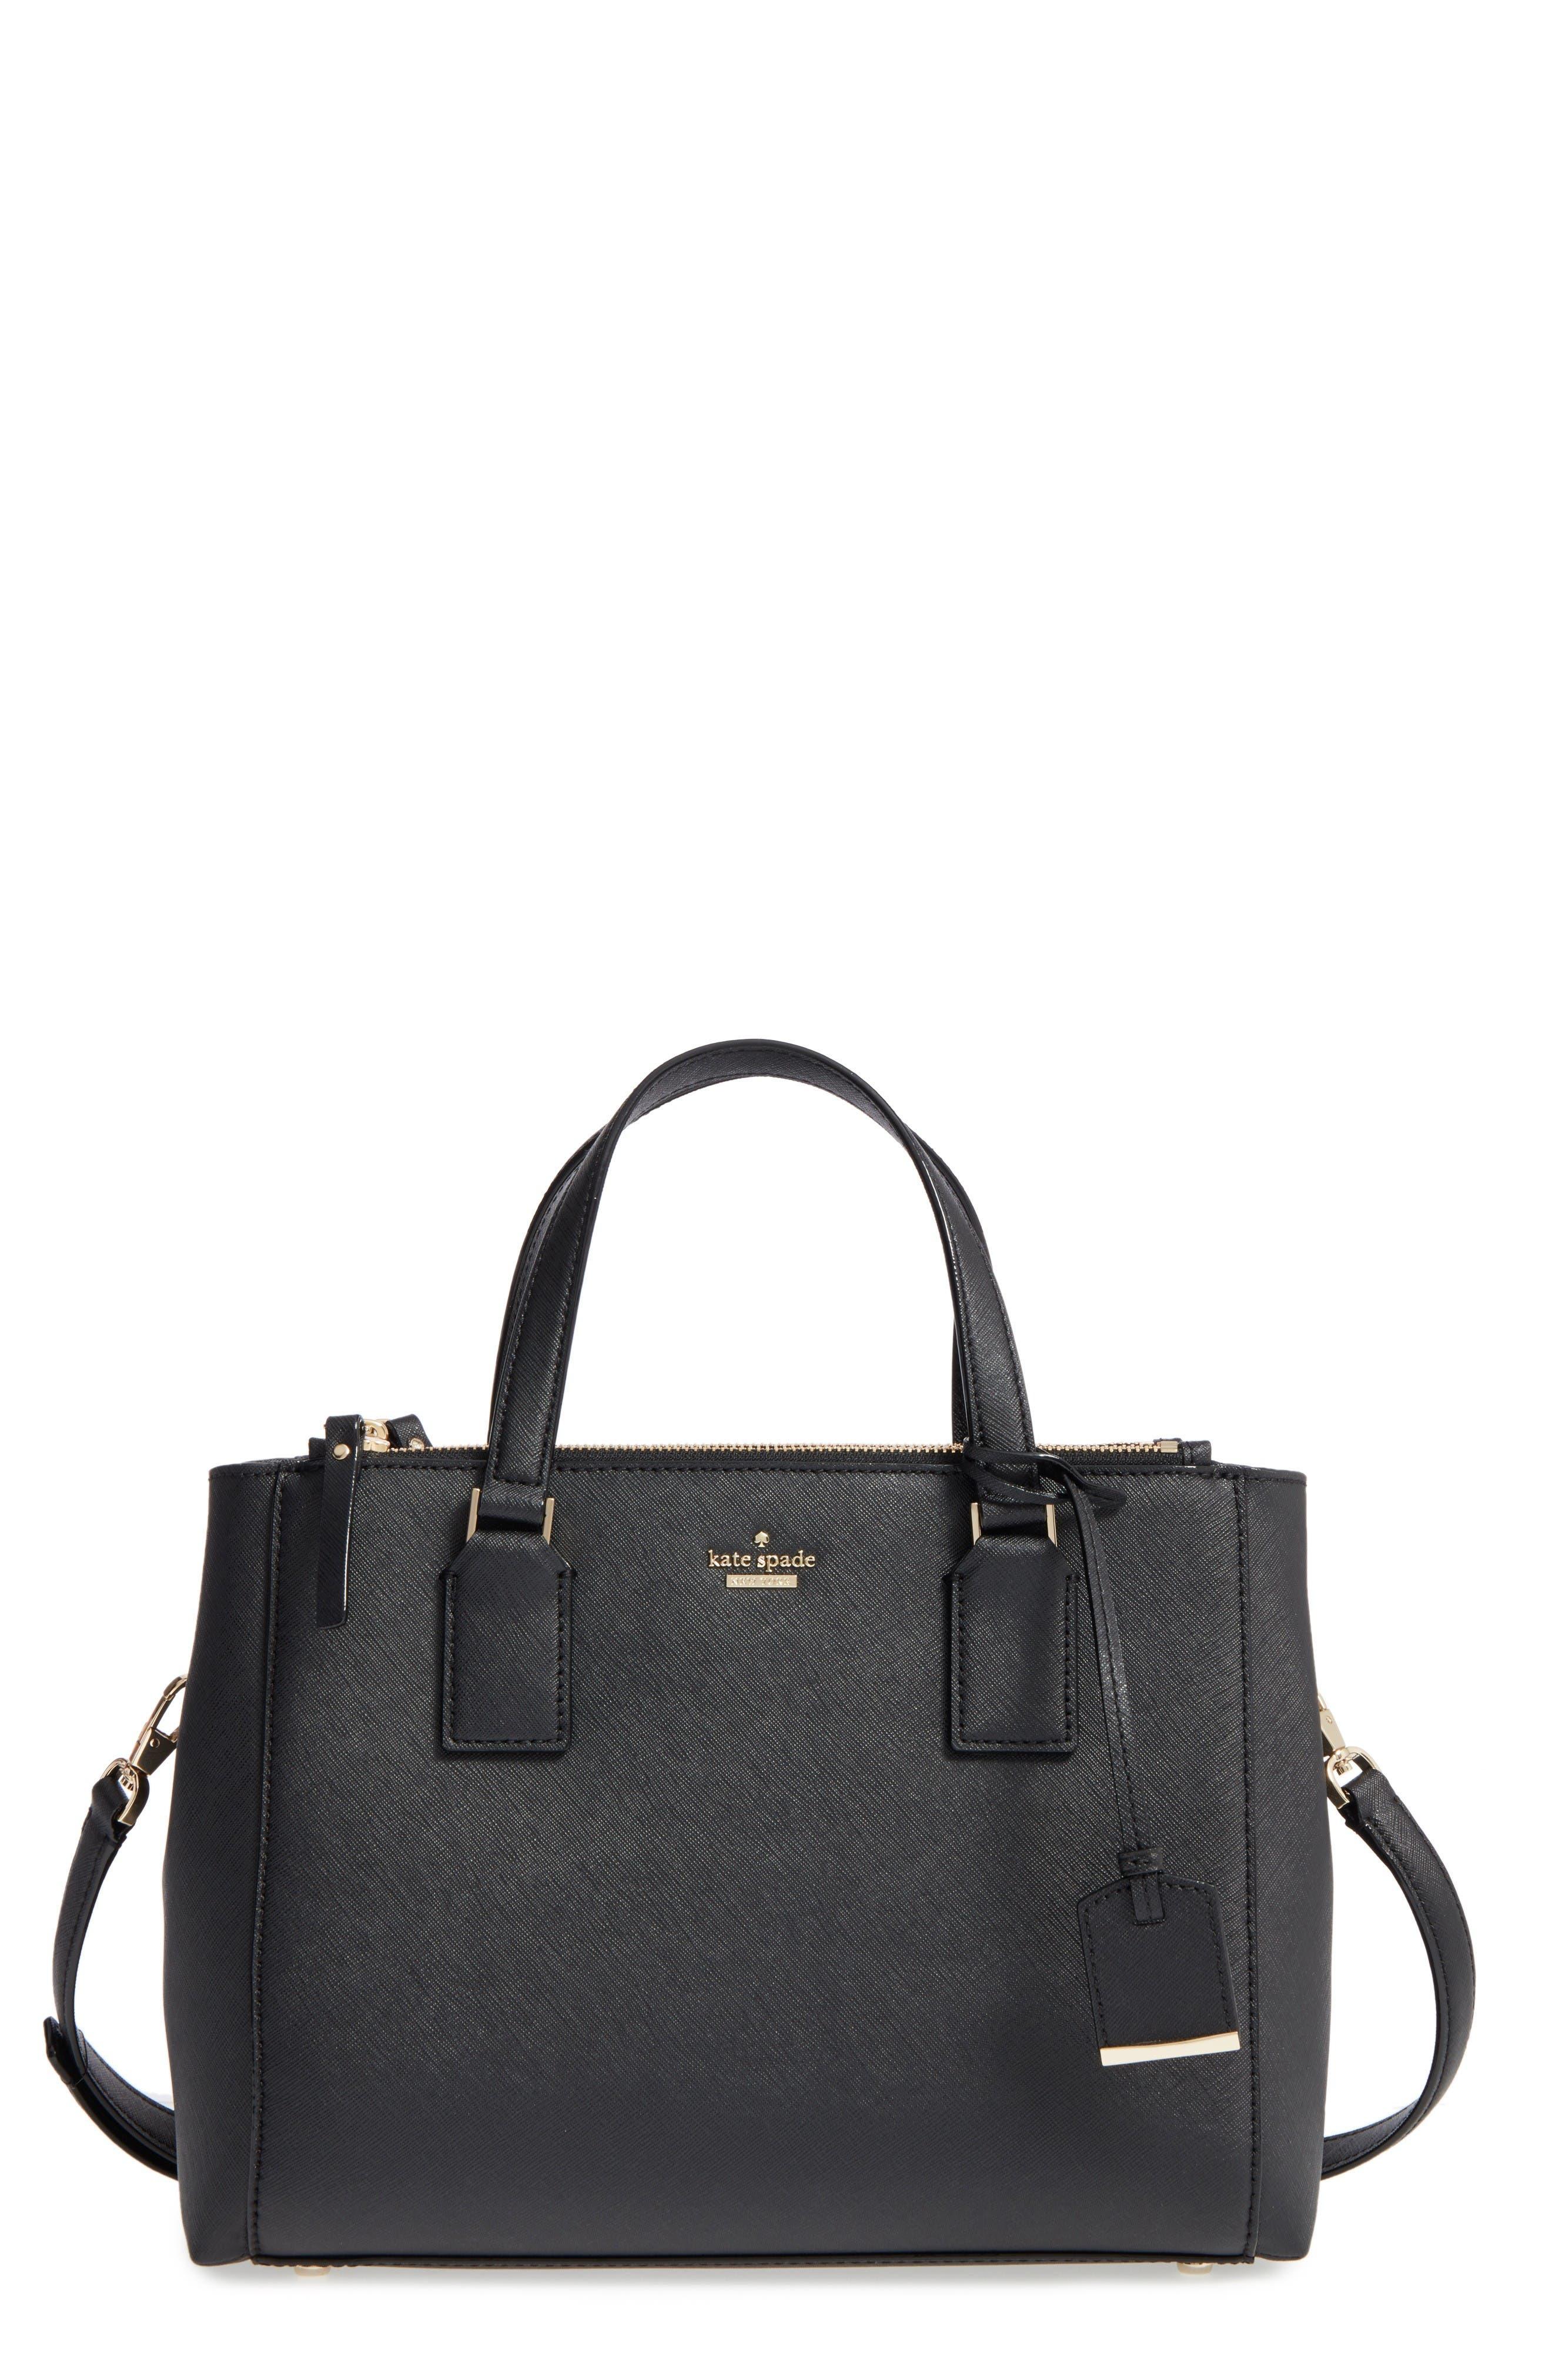 KATE SPADE NEW YORK cameron street - teegan calfskin leather satchel